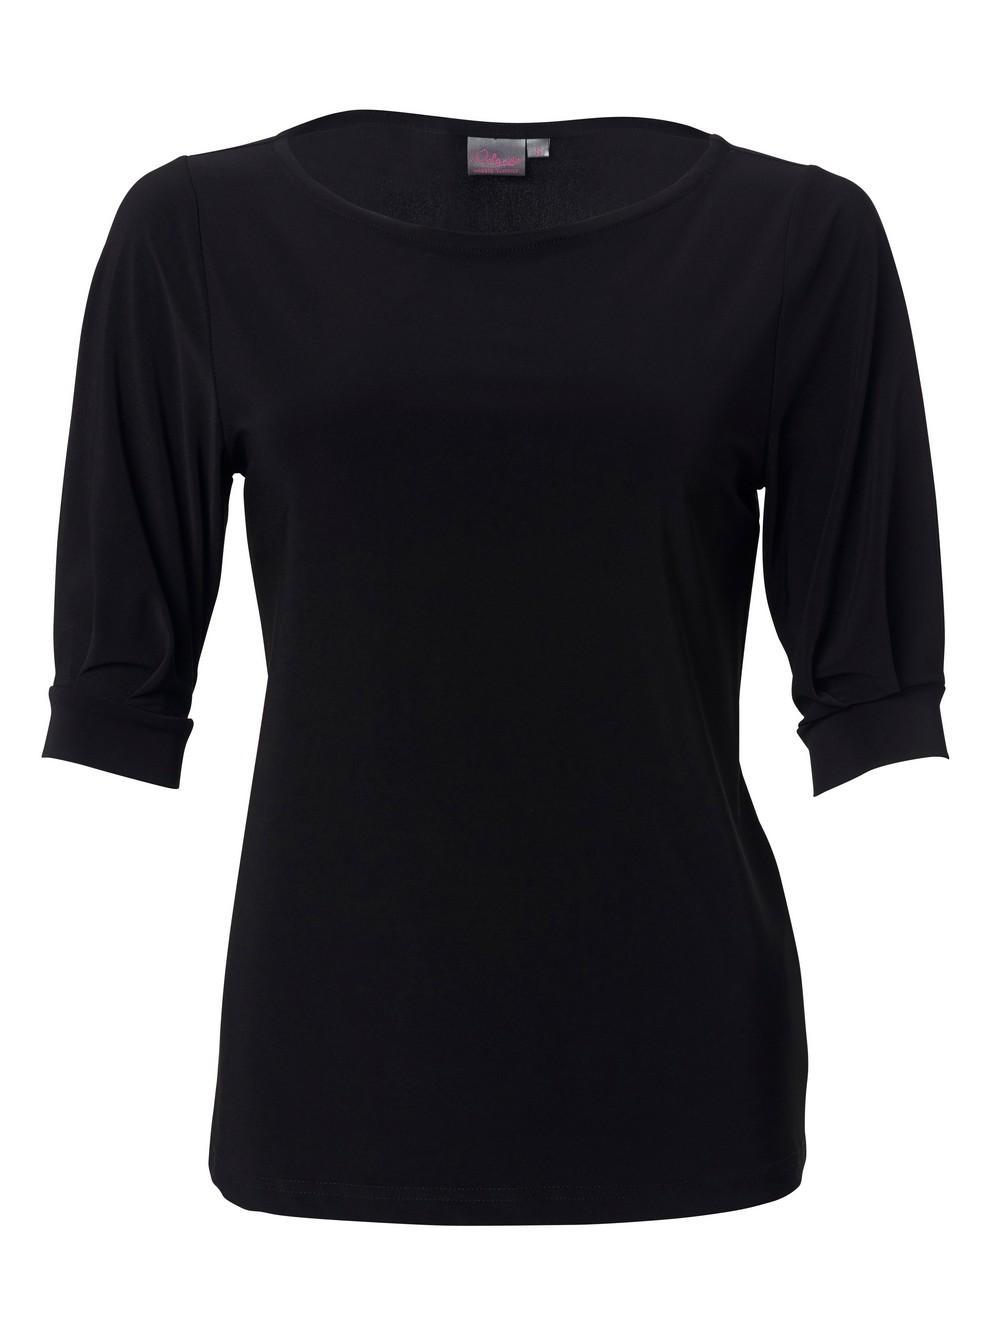 Leah K232 3/4 Blouse - Black